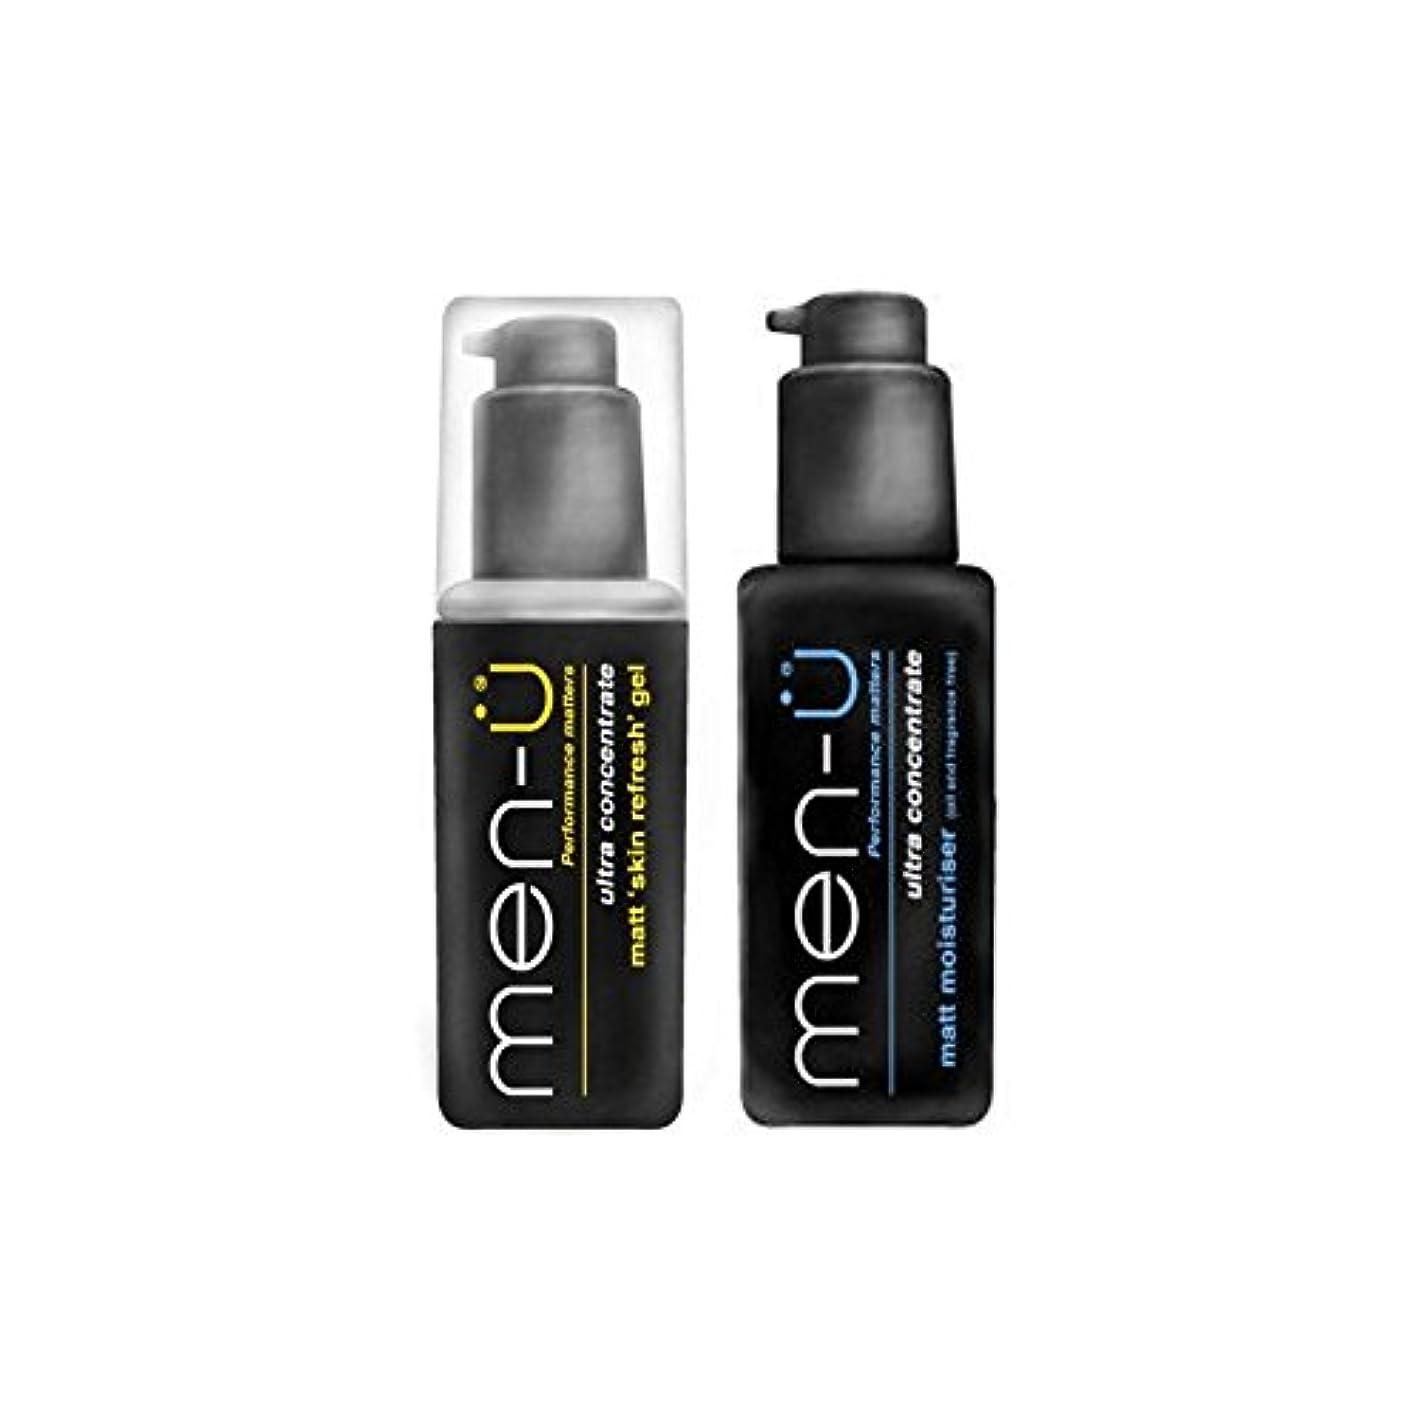 Men-? Matt Refresh And Moisturise Duo (Pack of 6) - 男性-のマットリフレッシュとデュオを保湿 x6 [並行輸入品]